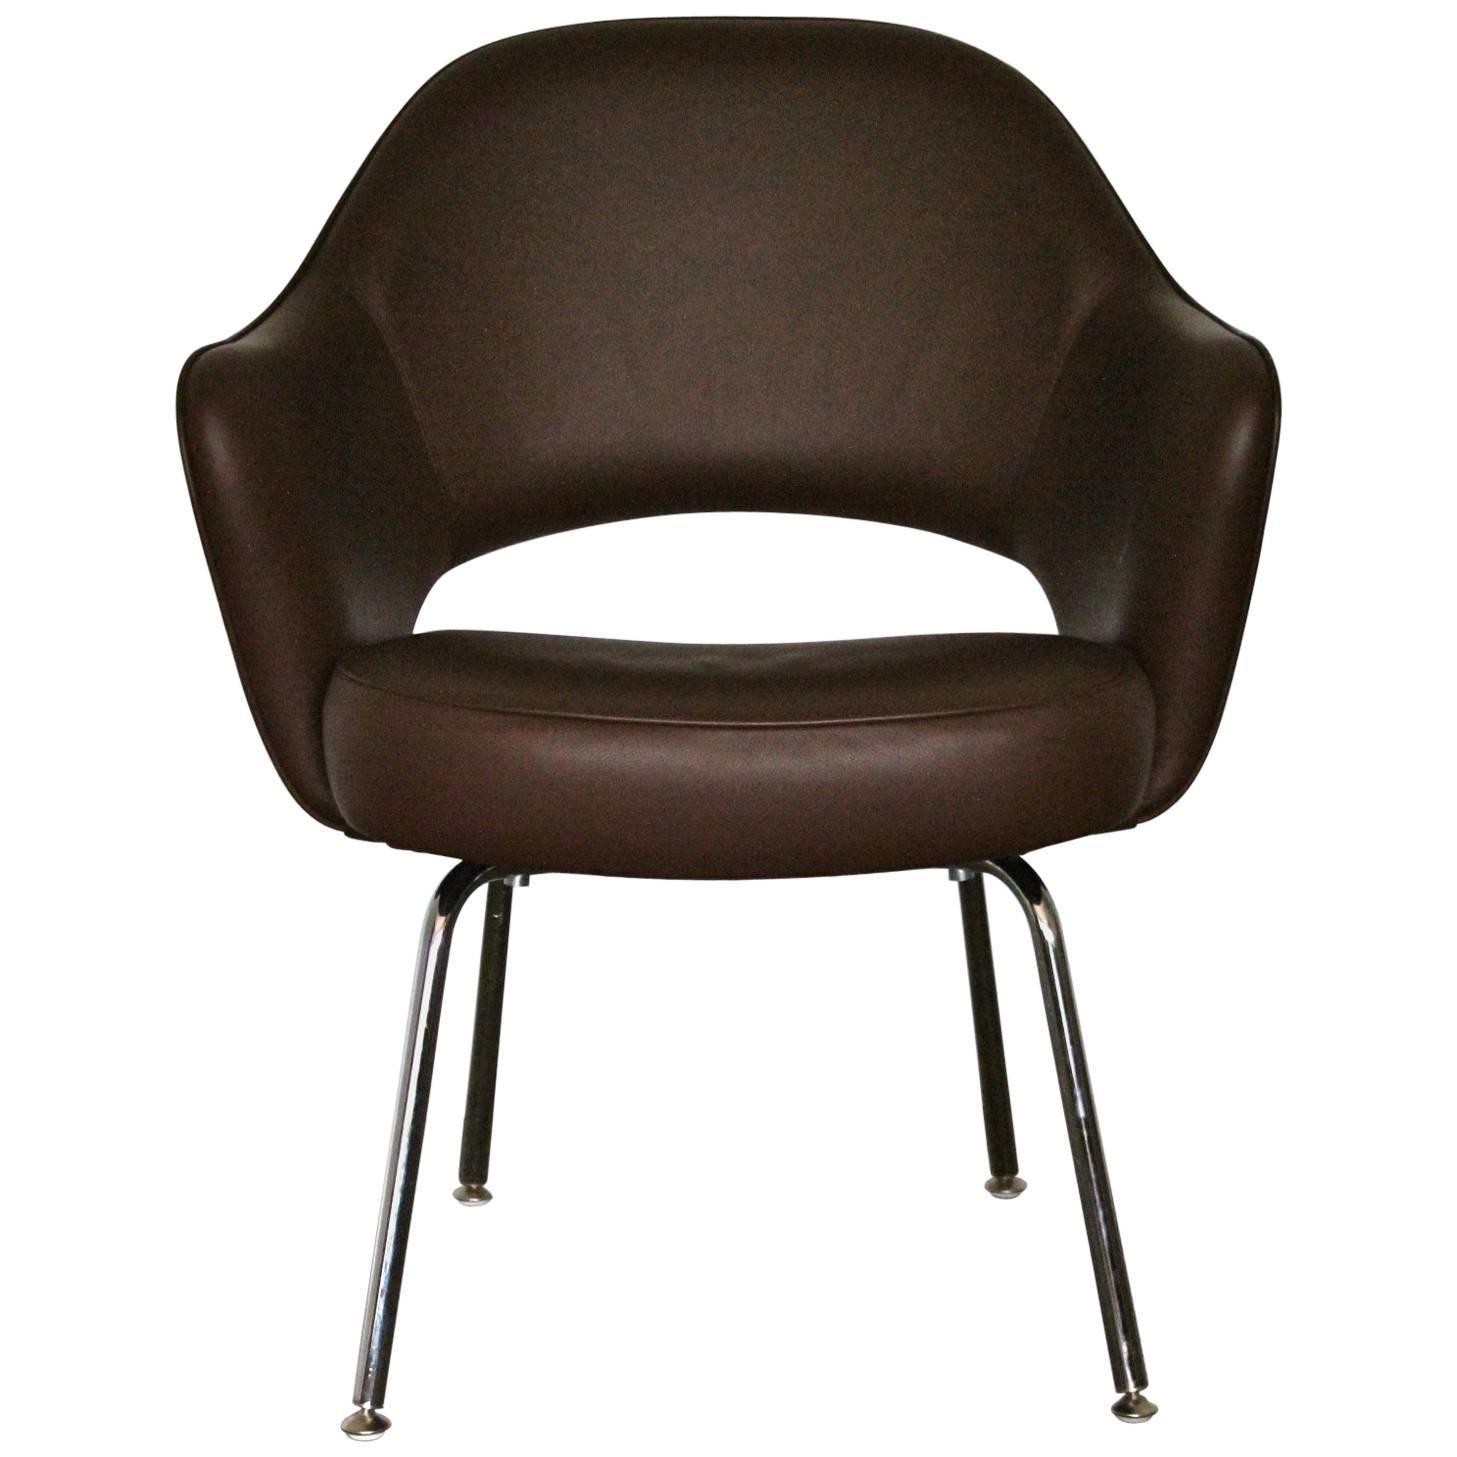 Knoll Studio U201cSaarinen Executiveu201d Armchair In U201cVolou201d Brown Leather